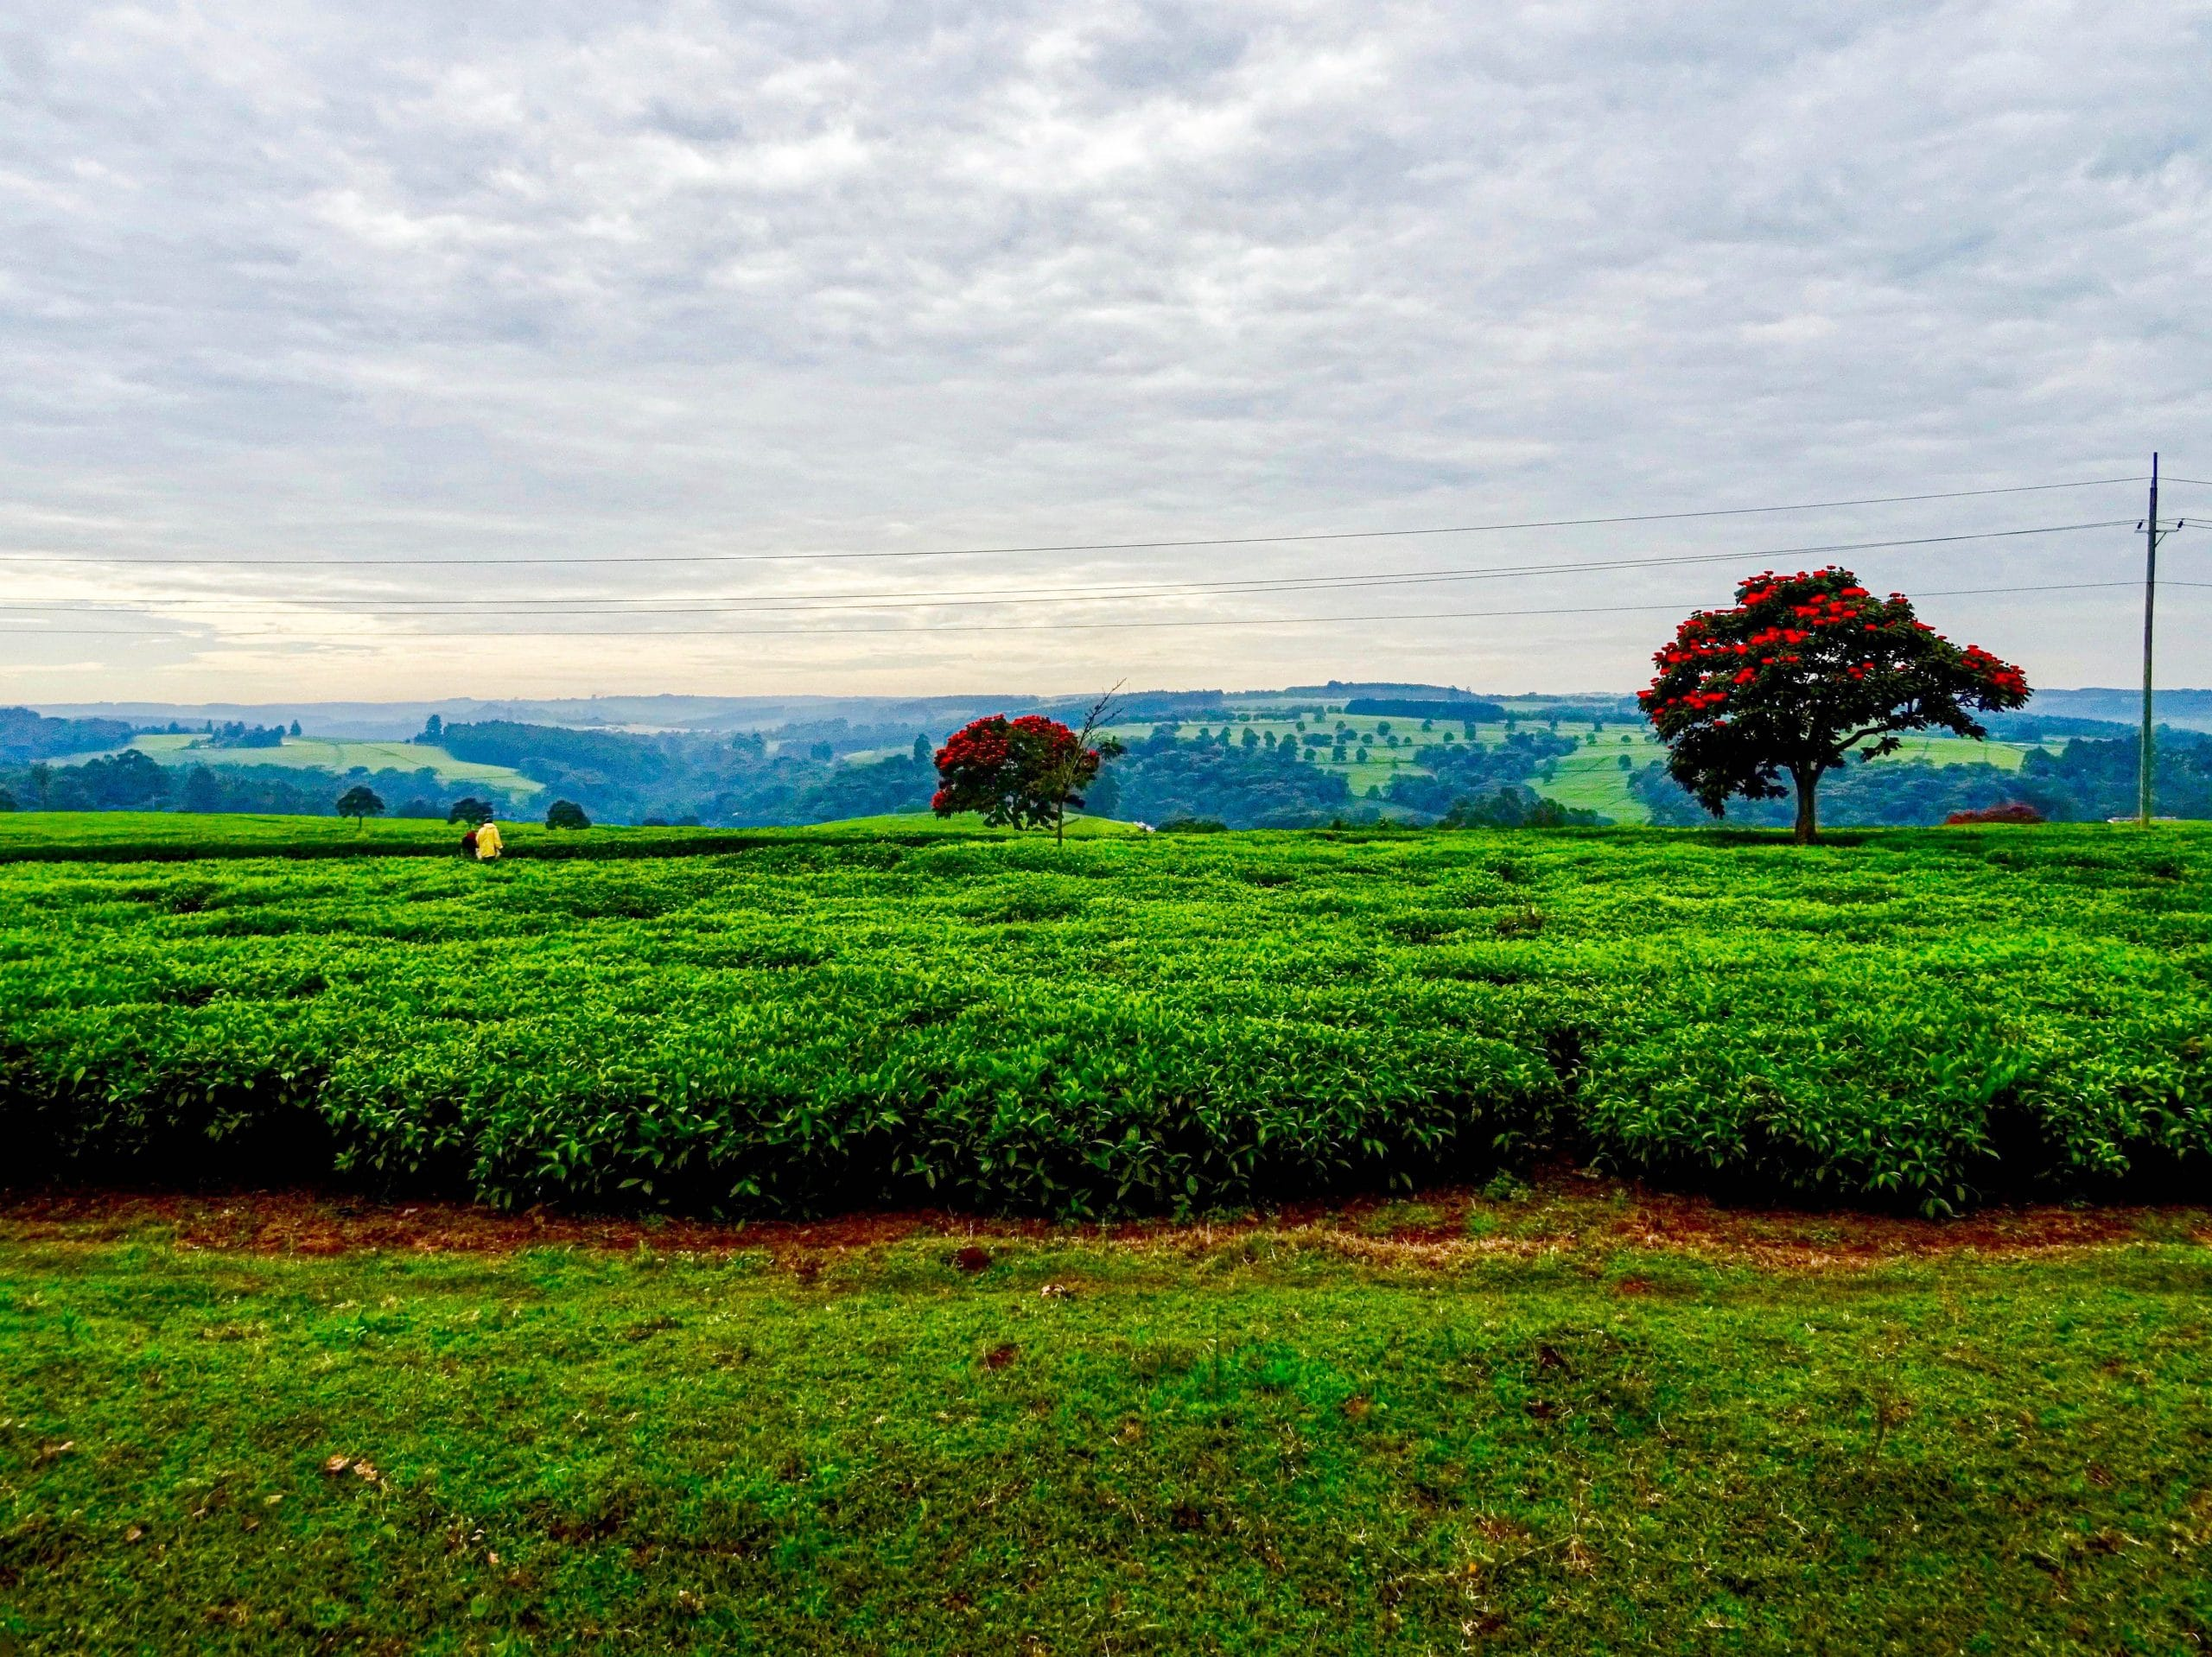 Theeplantage van Unilever in Kericho County